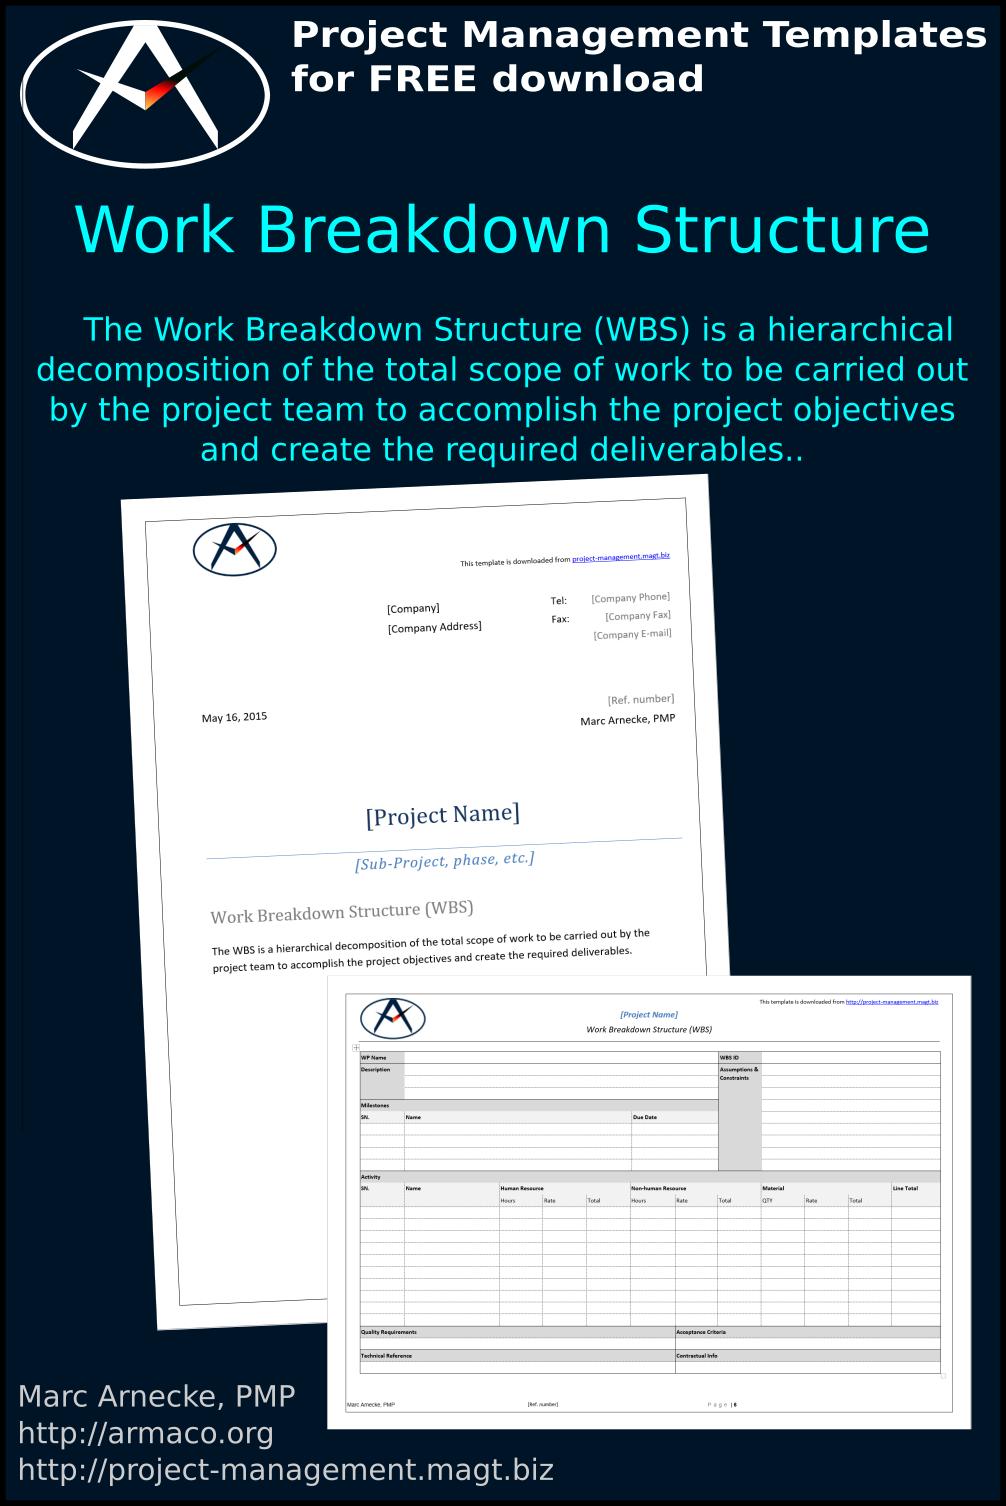 Download work breakdown structure template